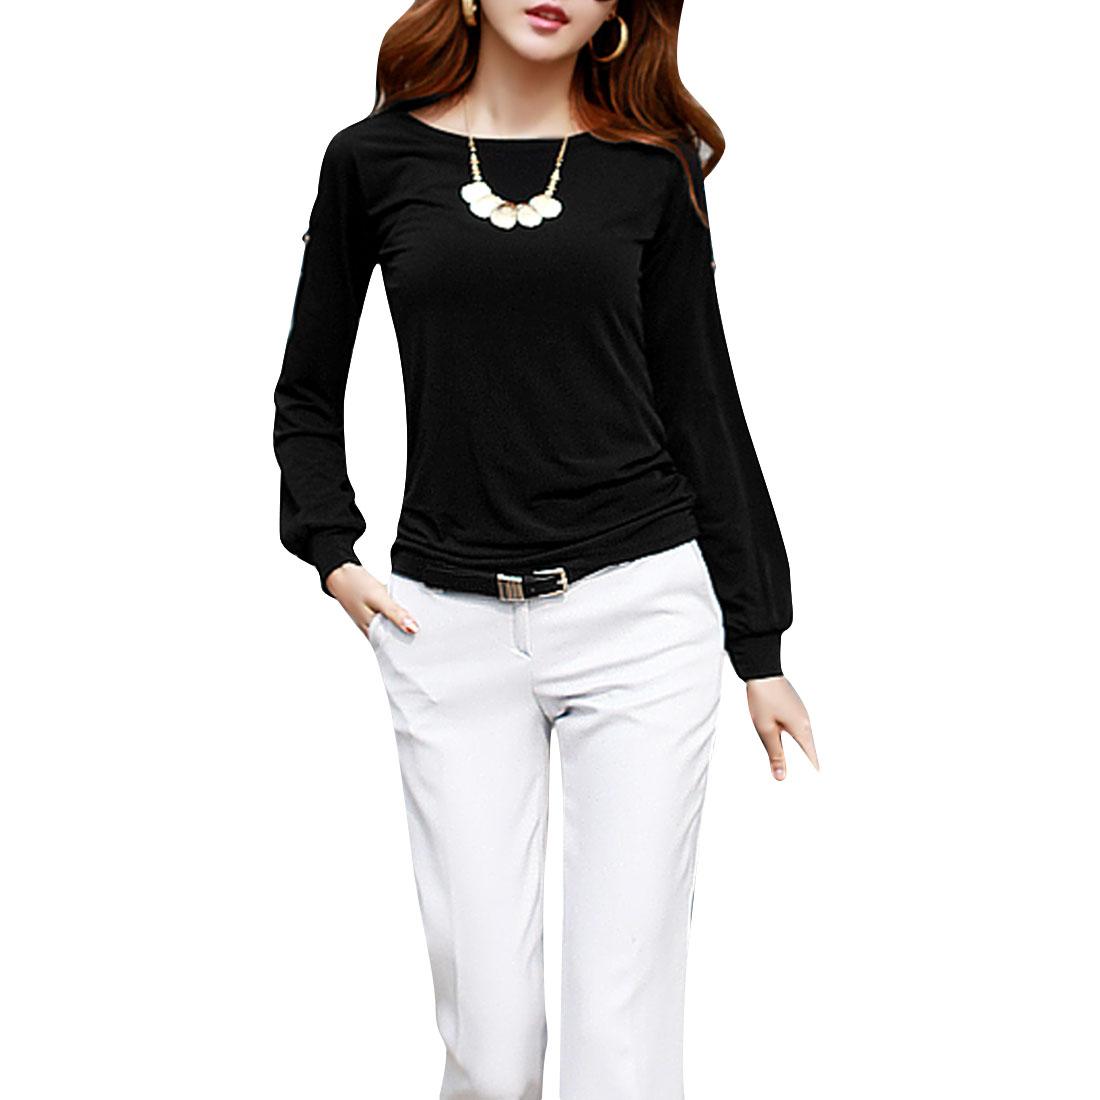 Lady Scoop Neck Cut Out Shoulder Detail Slim Black Tee Shirt XS